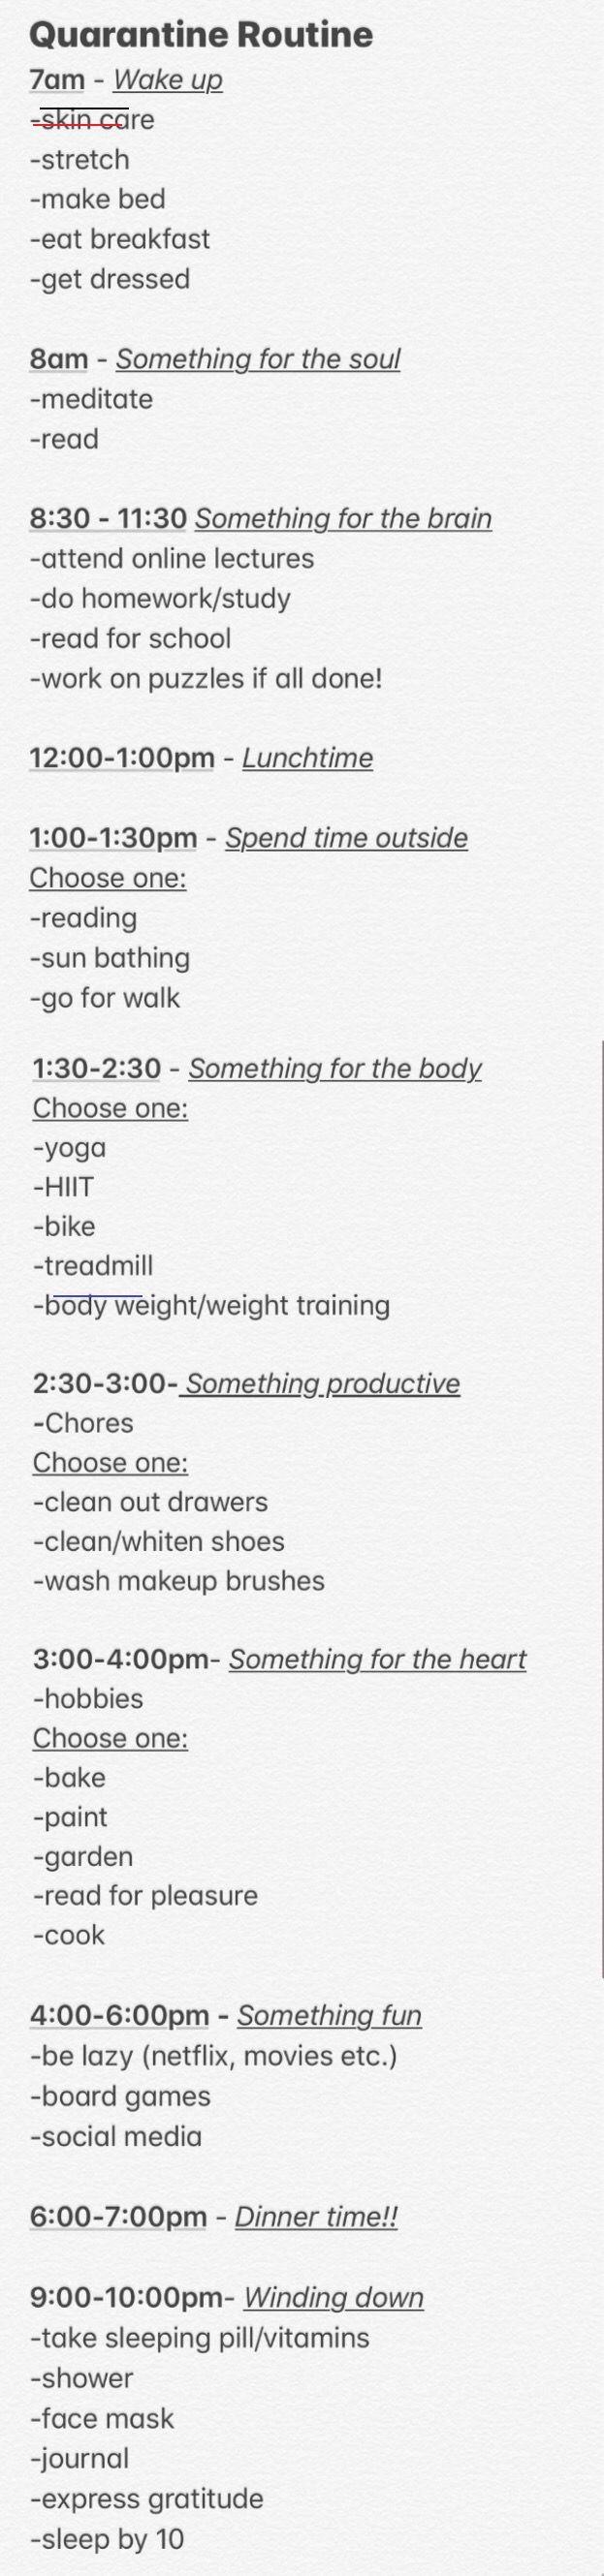 Pin on At home workout plan